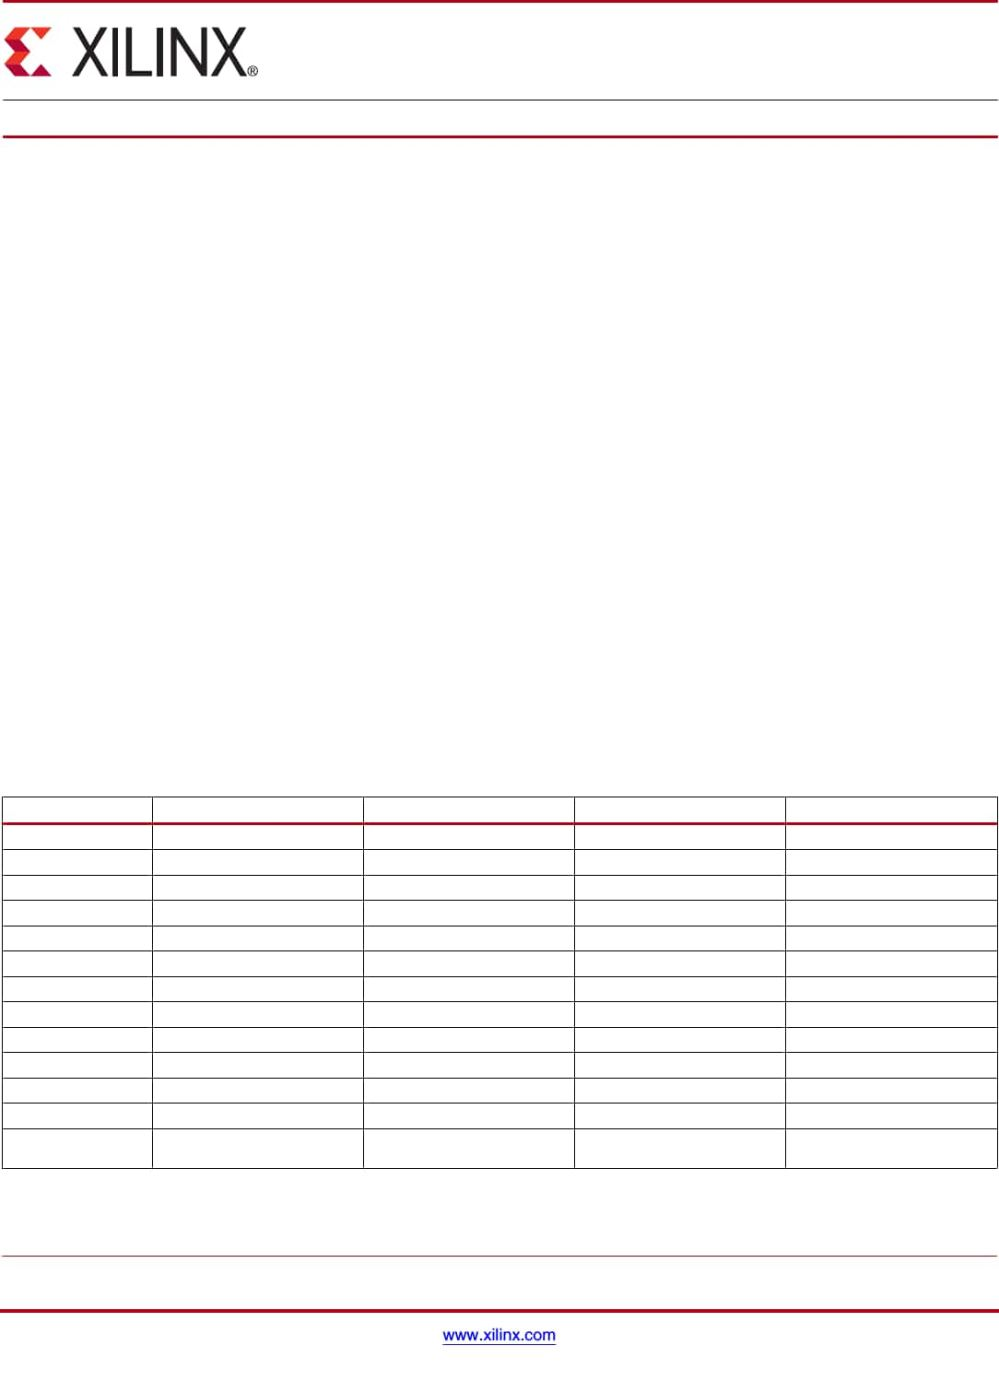 medium resolution of 7 series fpga overview datasheet